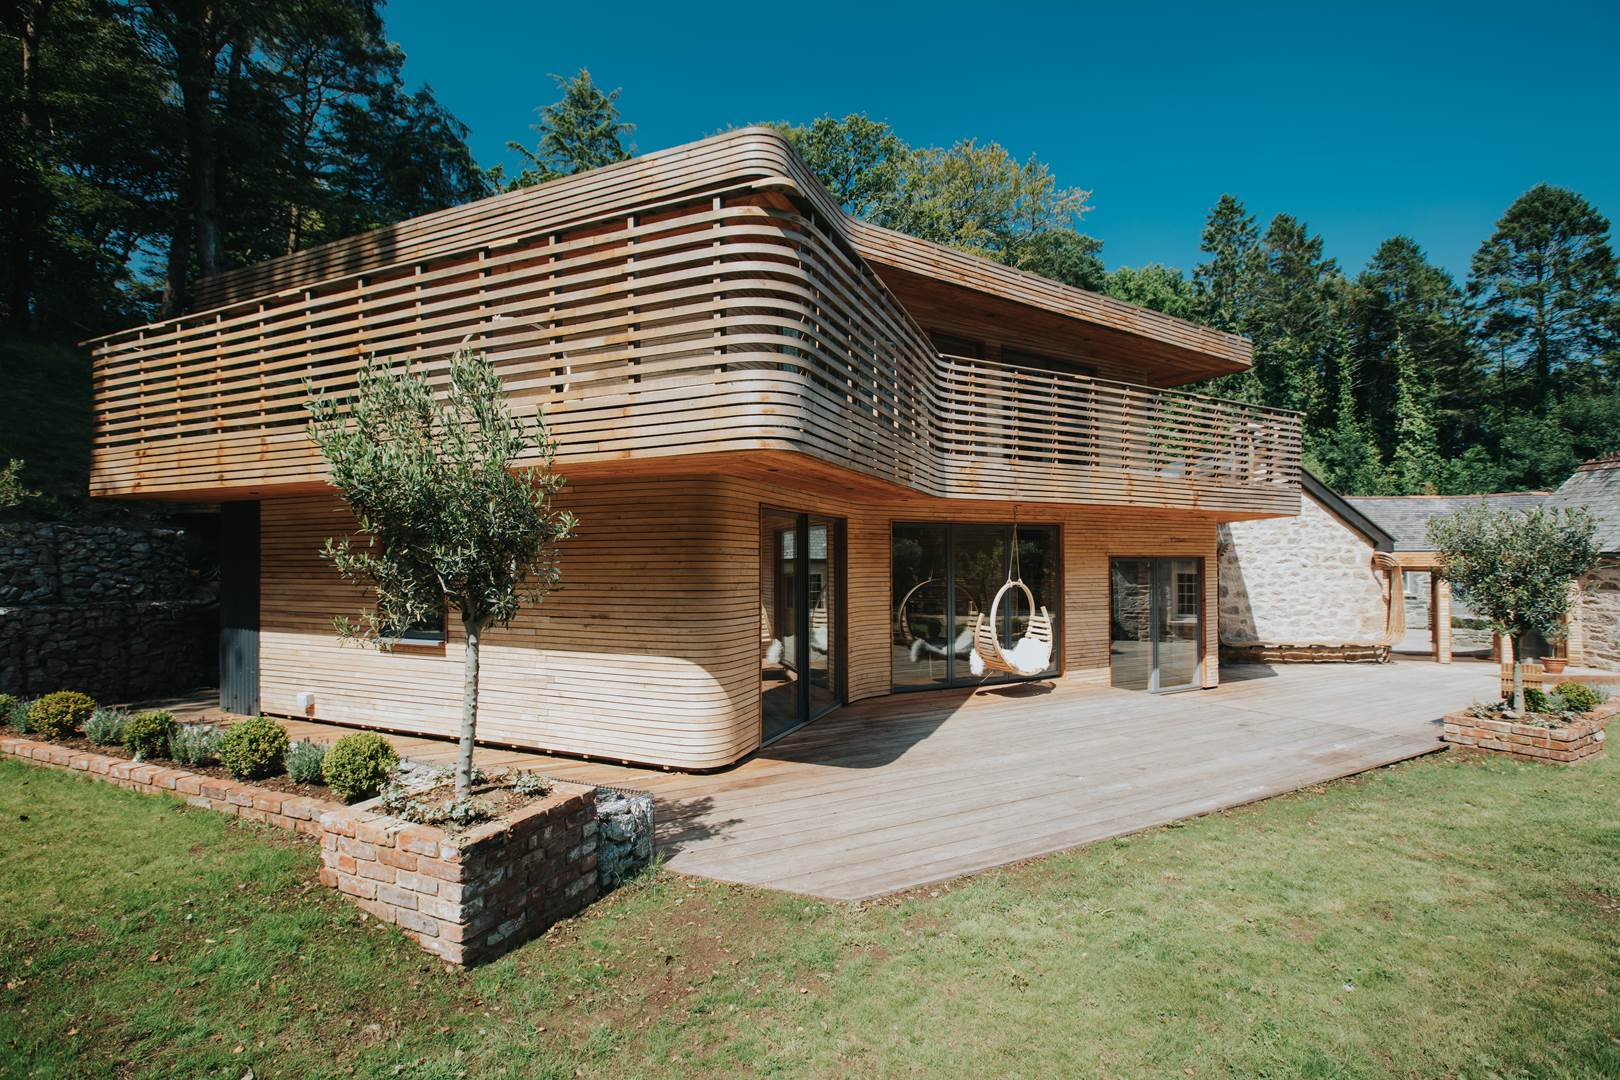 081-tom-raffield-grand-designs-house (Copy)